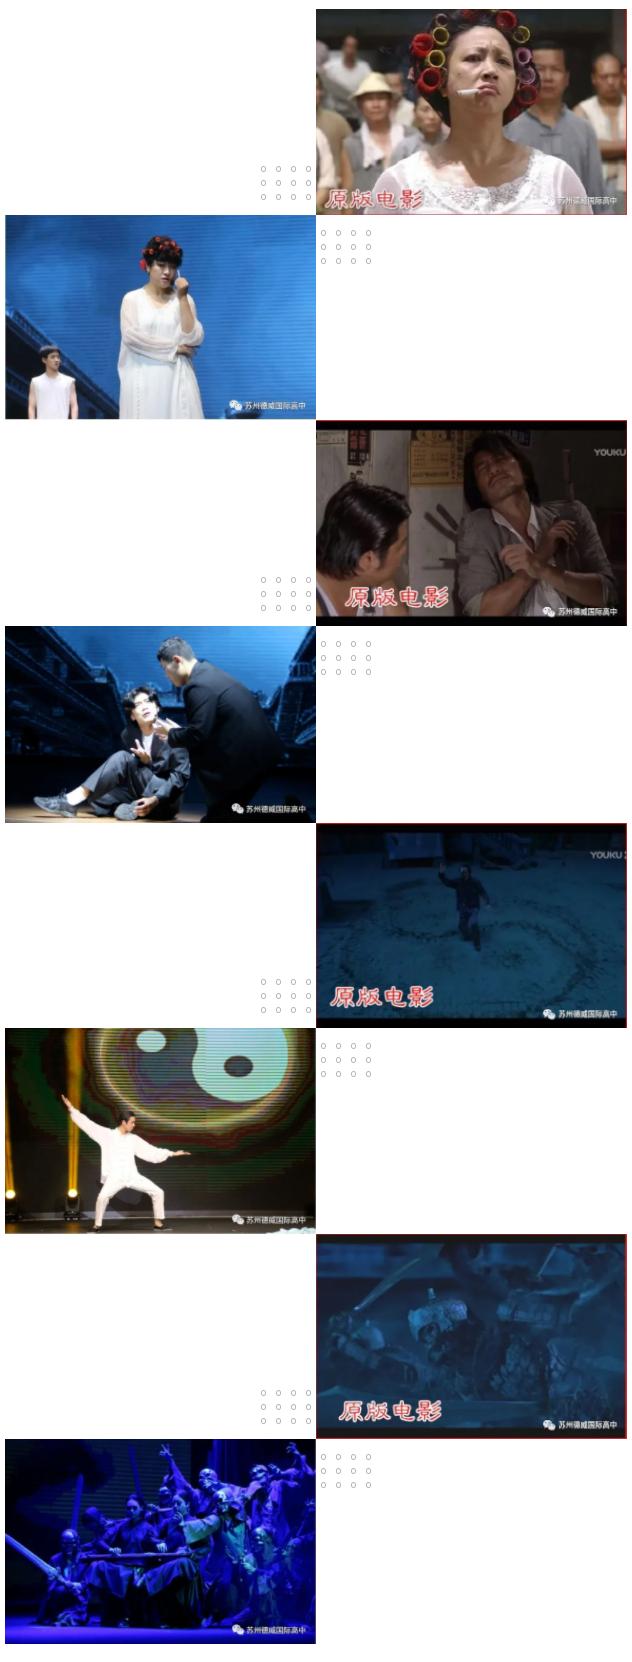 kong-fu-image-01